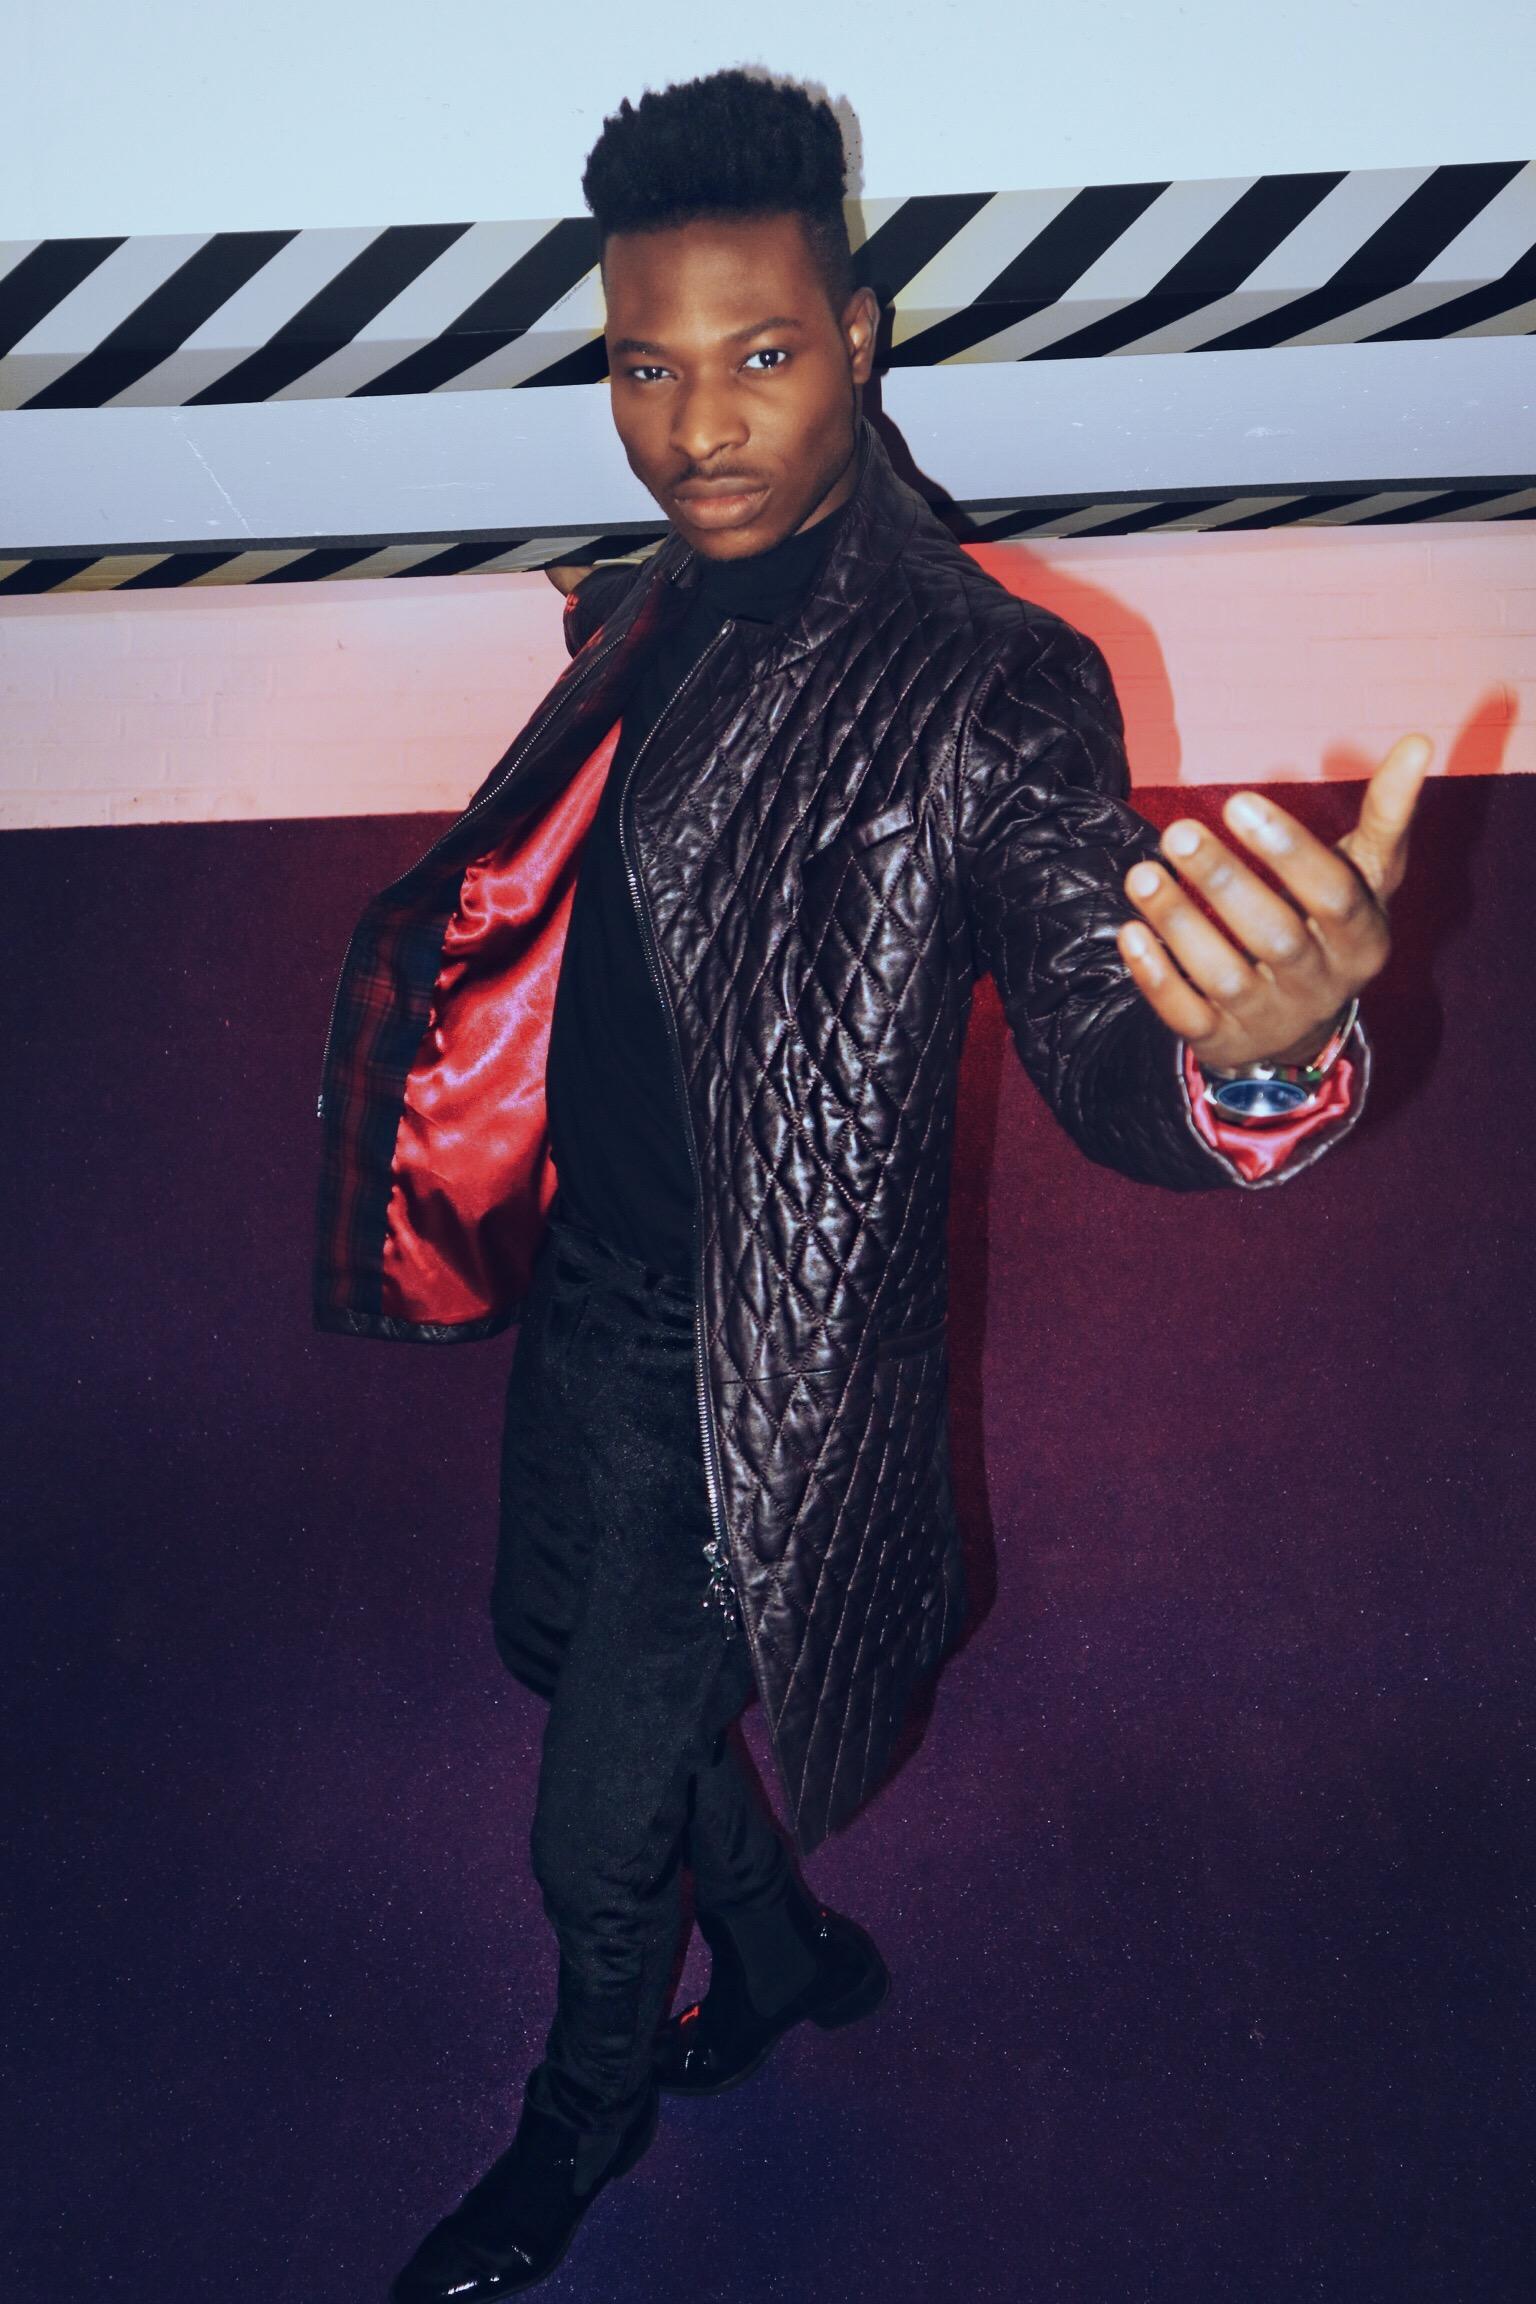 Charles Cameron jacket